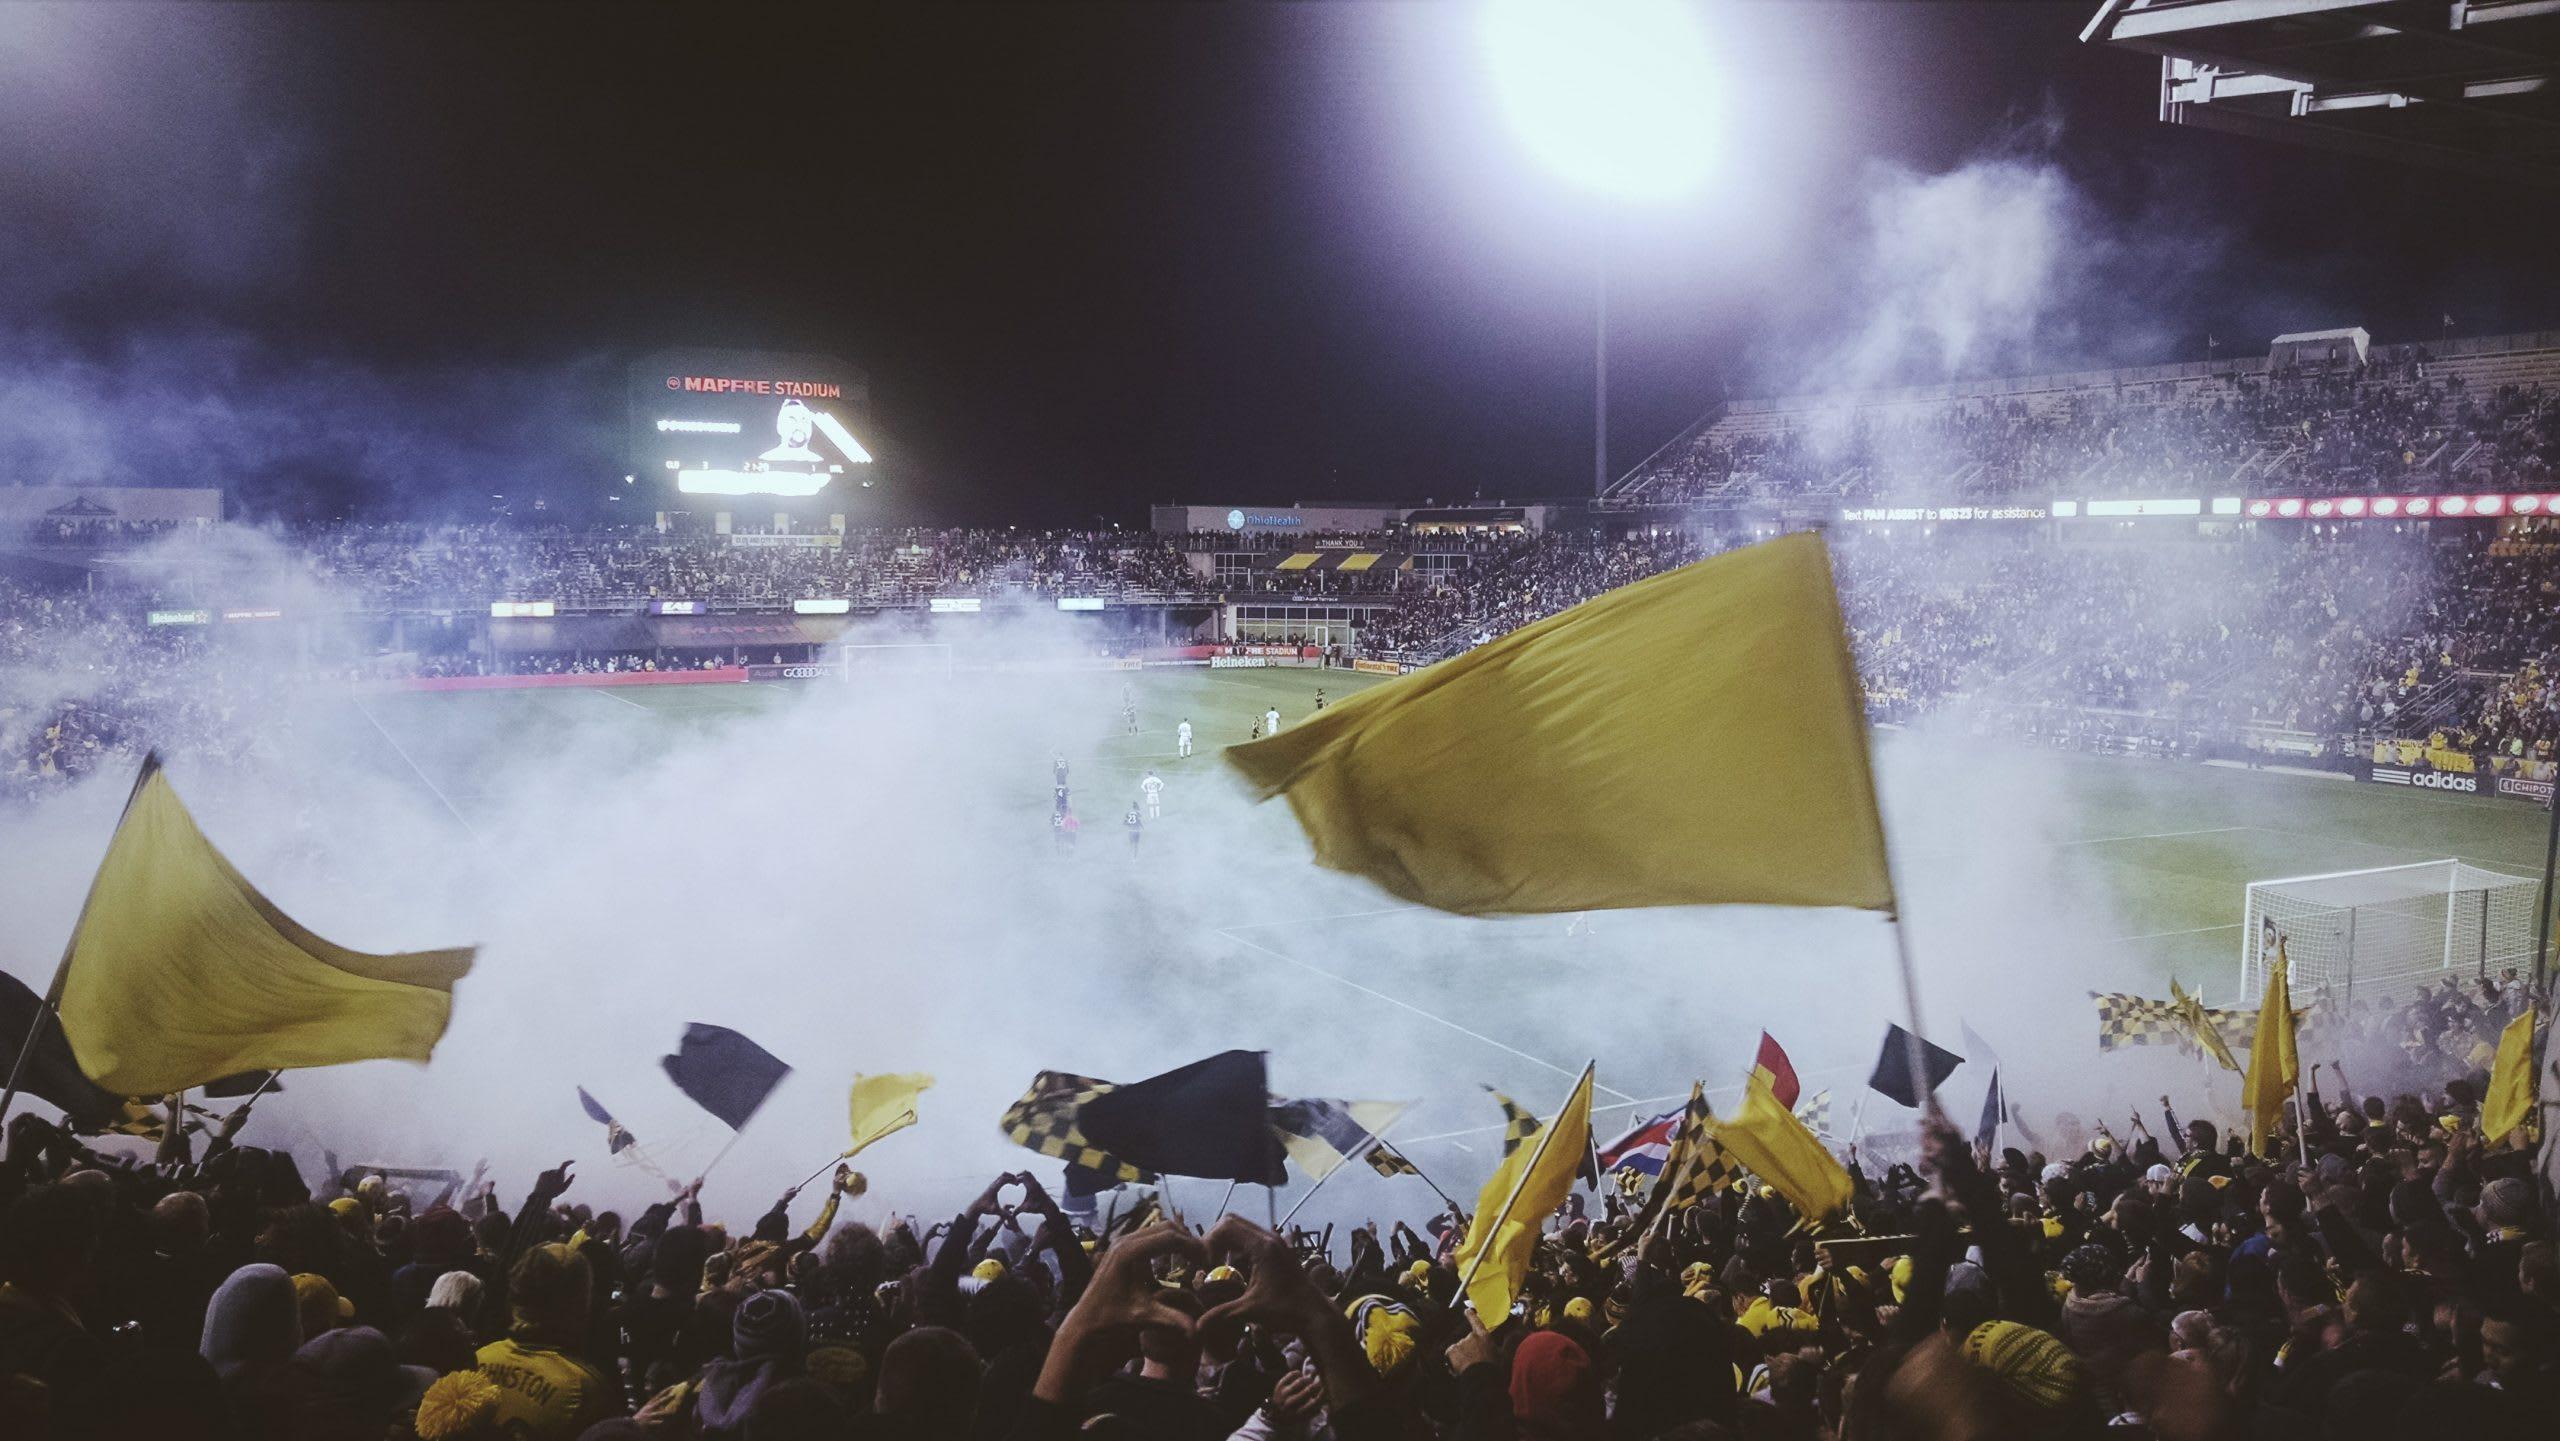 Soccer fans at game